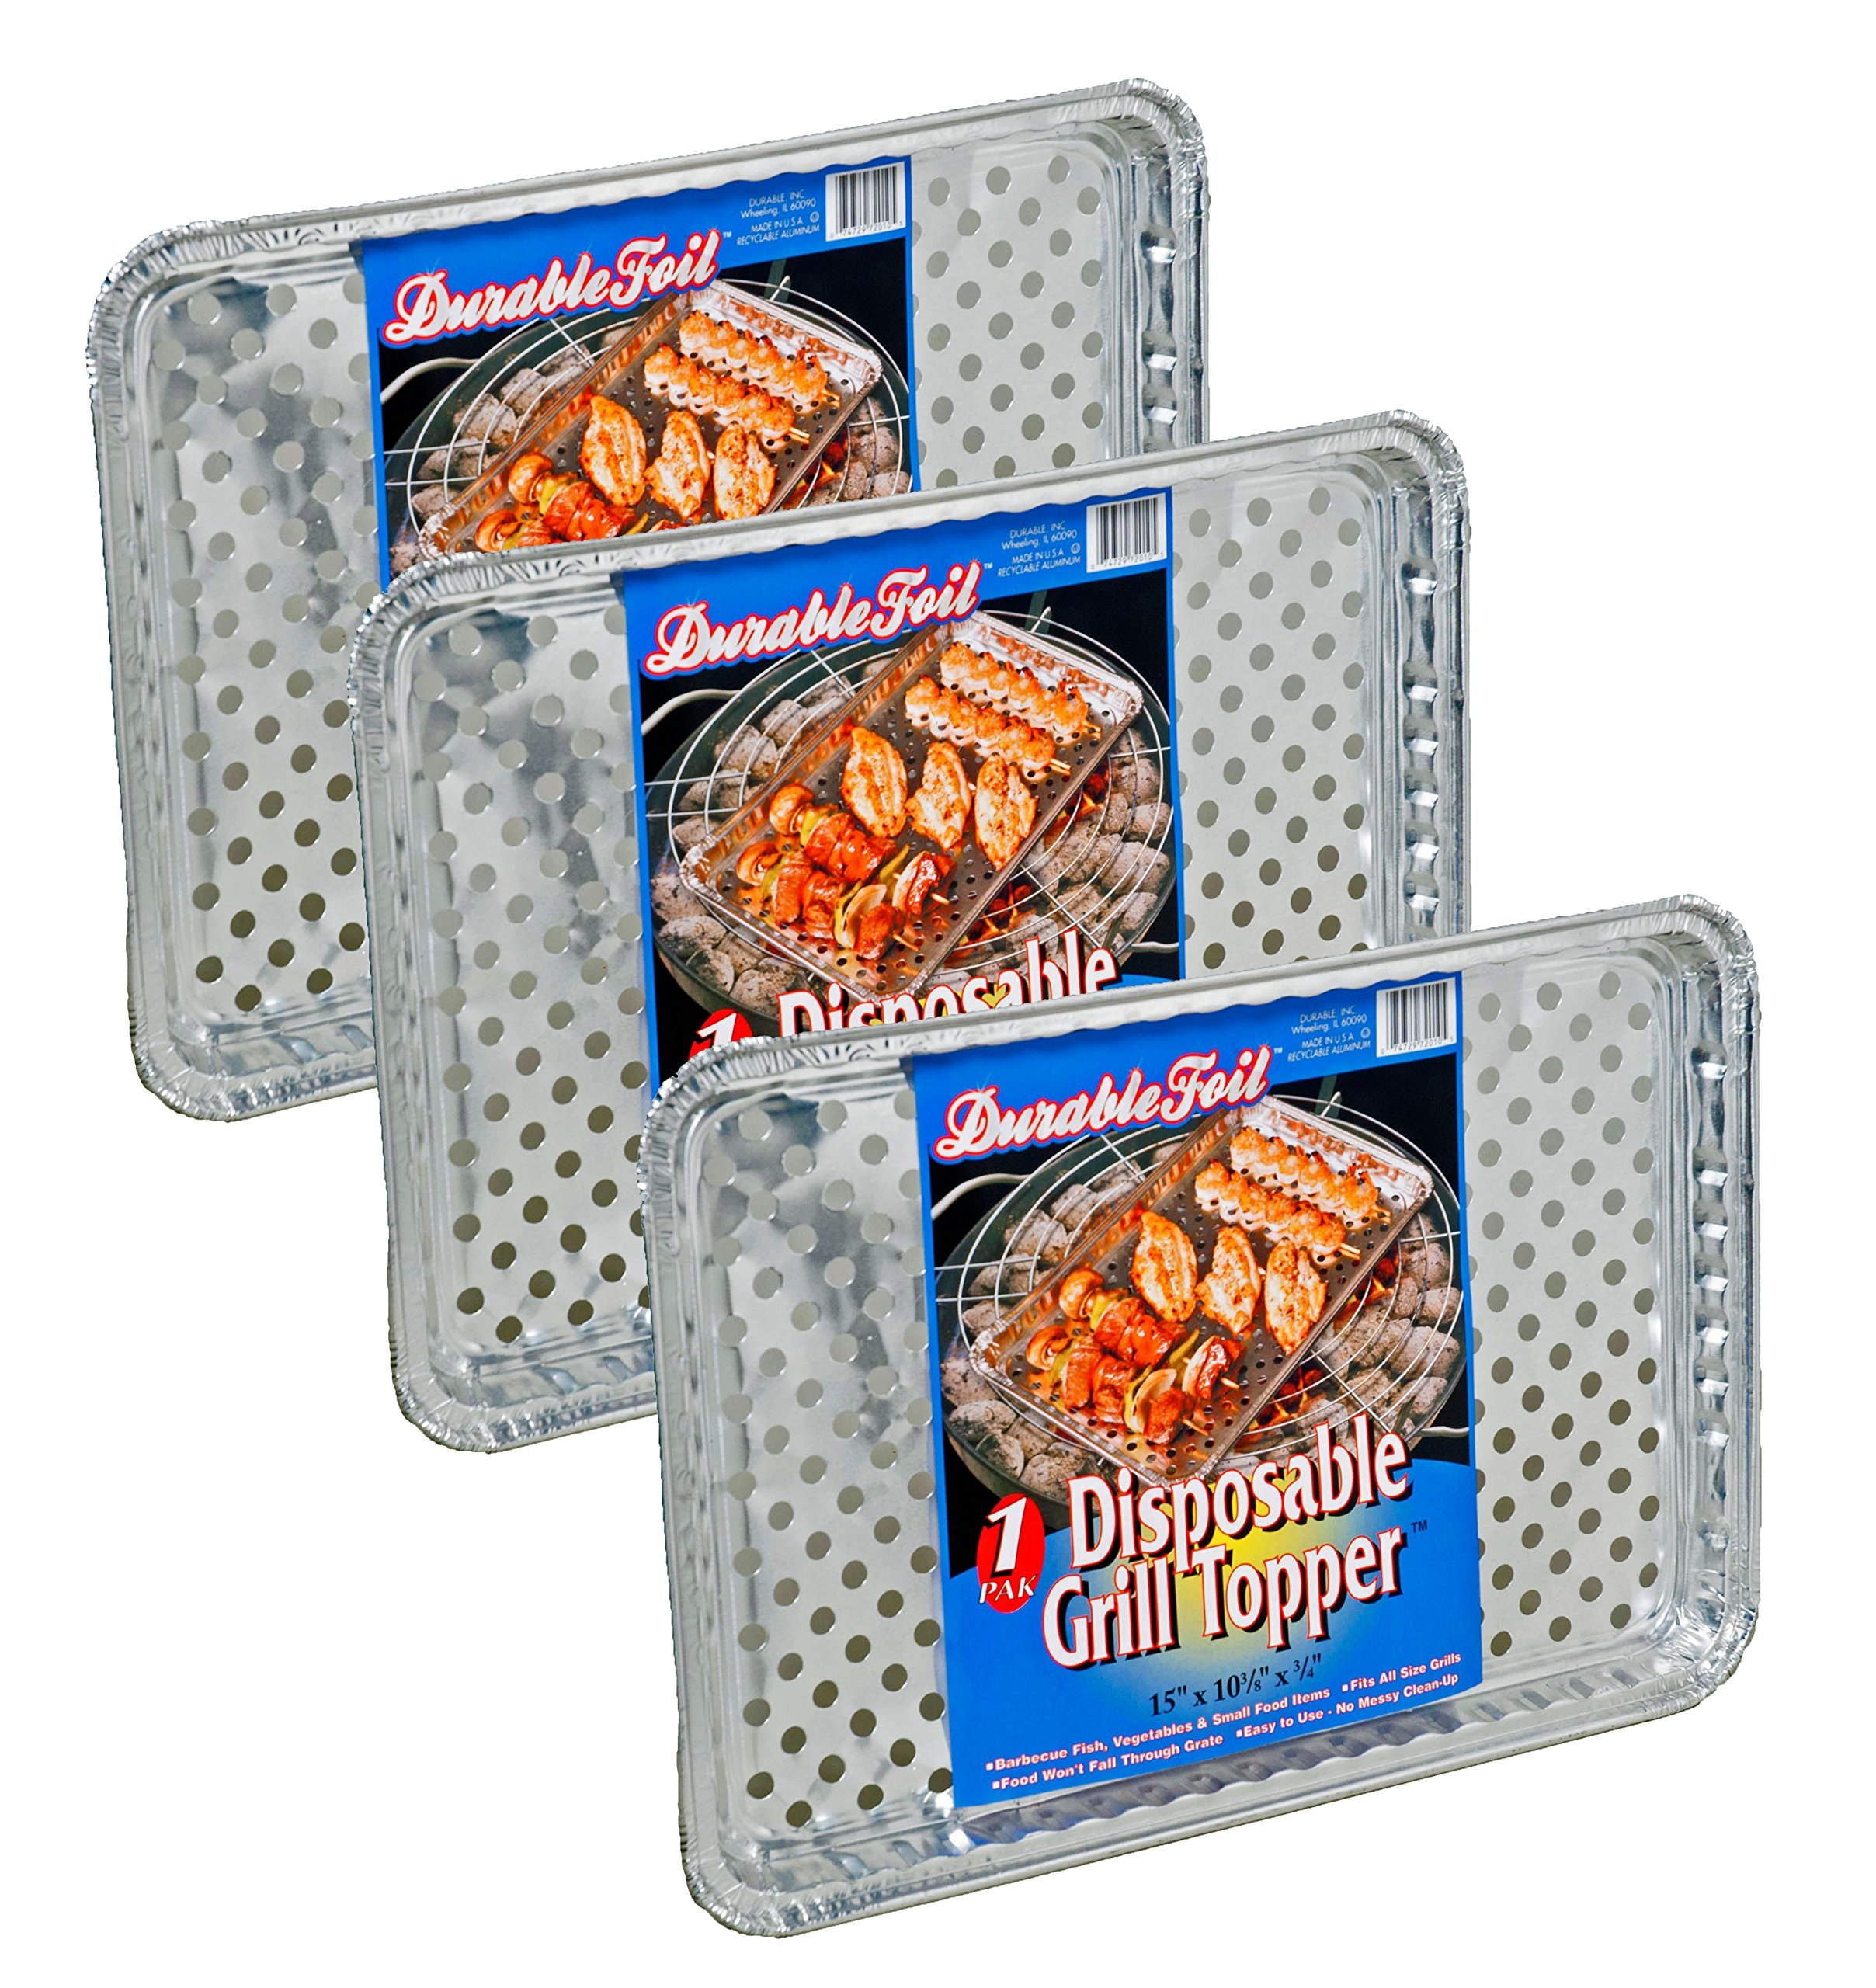 Set of 12 Durable Foil Disposable Deep Grill Topper Pans 11 3/4'' L x 9 1/4'' W x 1 1/2'' D by Durable (Image #4)